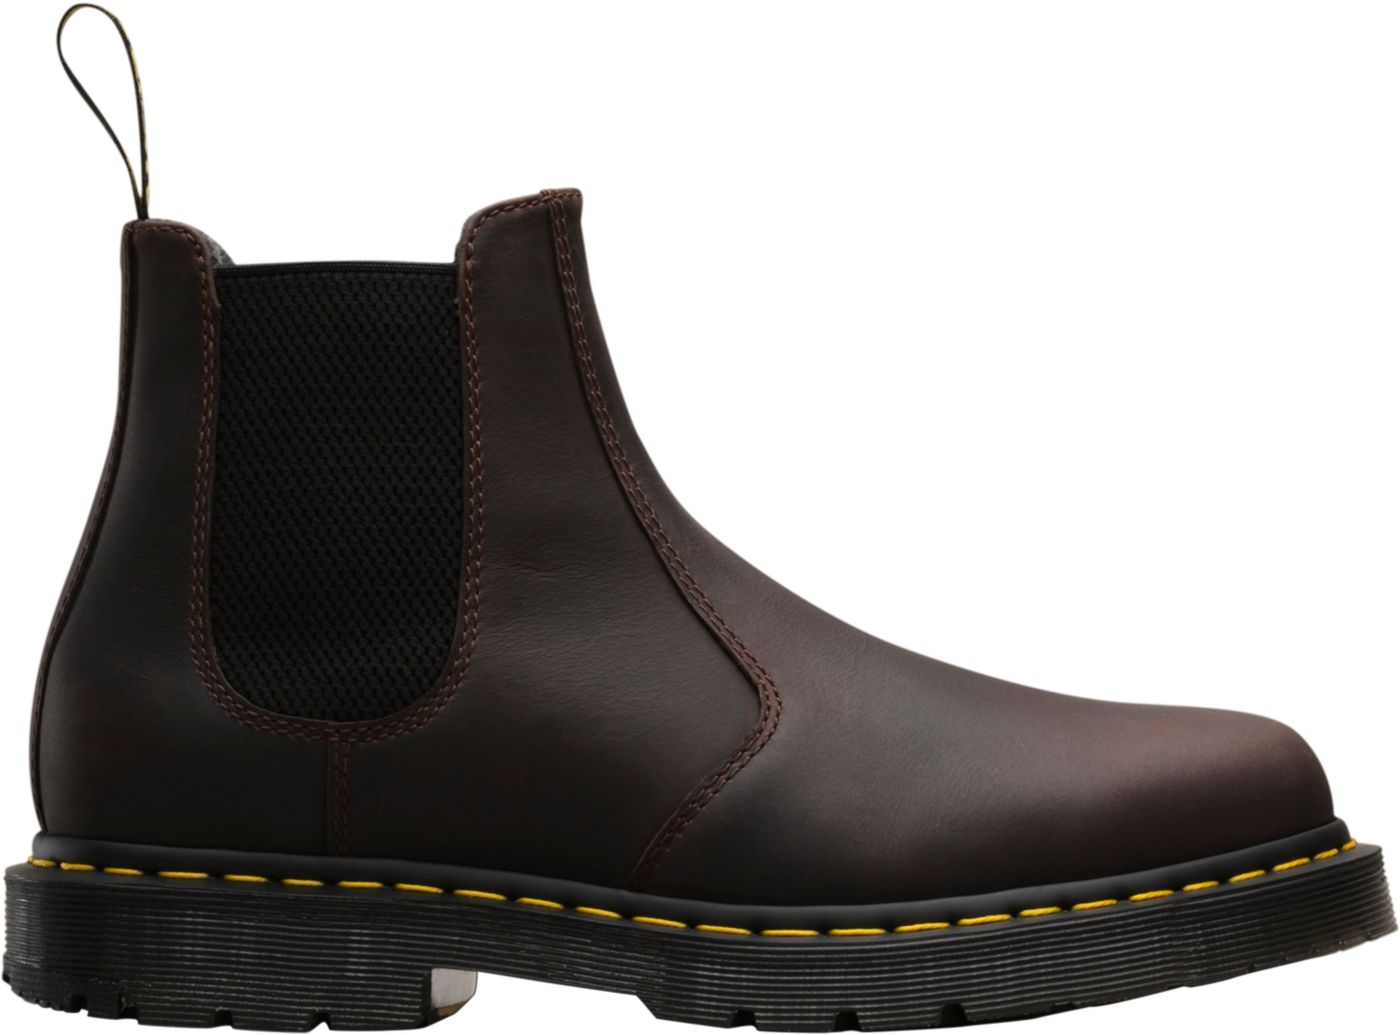 Dr. Martens Men's 2976 WinterGrip Winter Boots